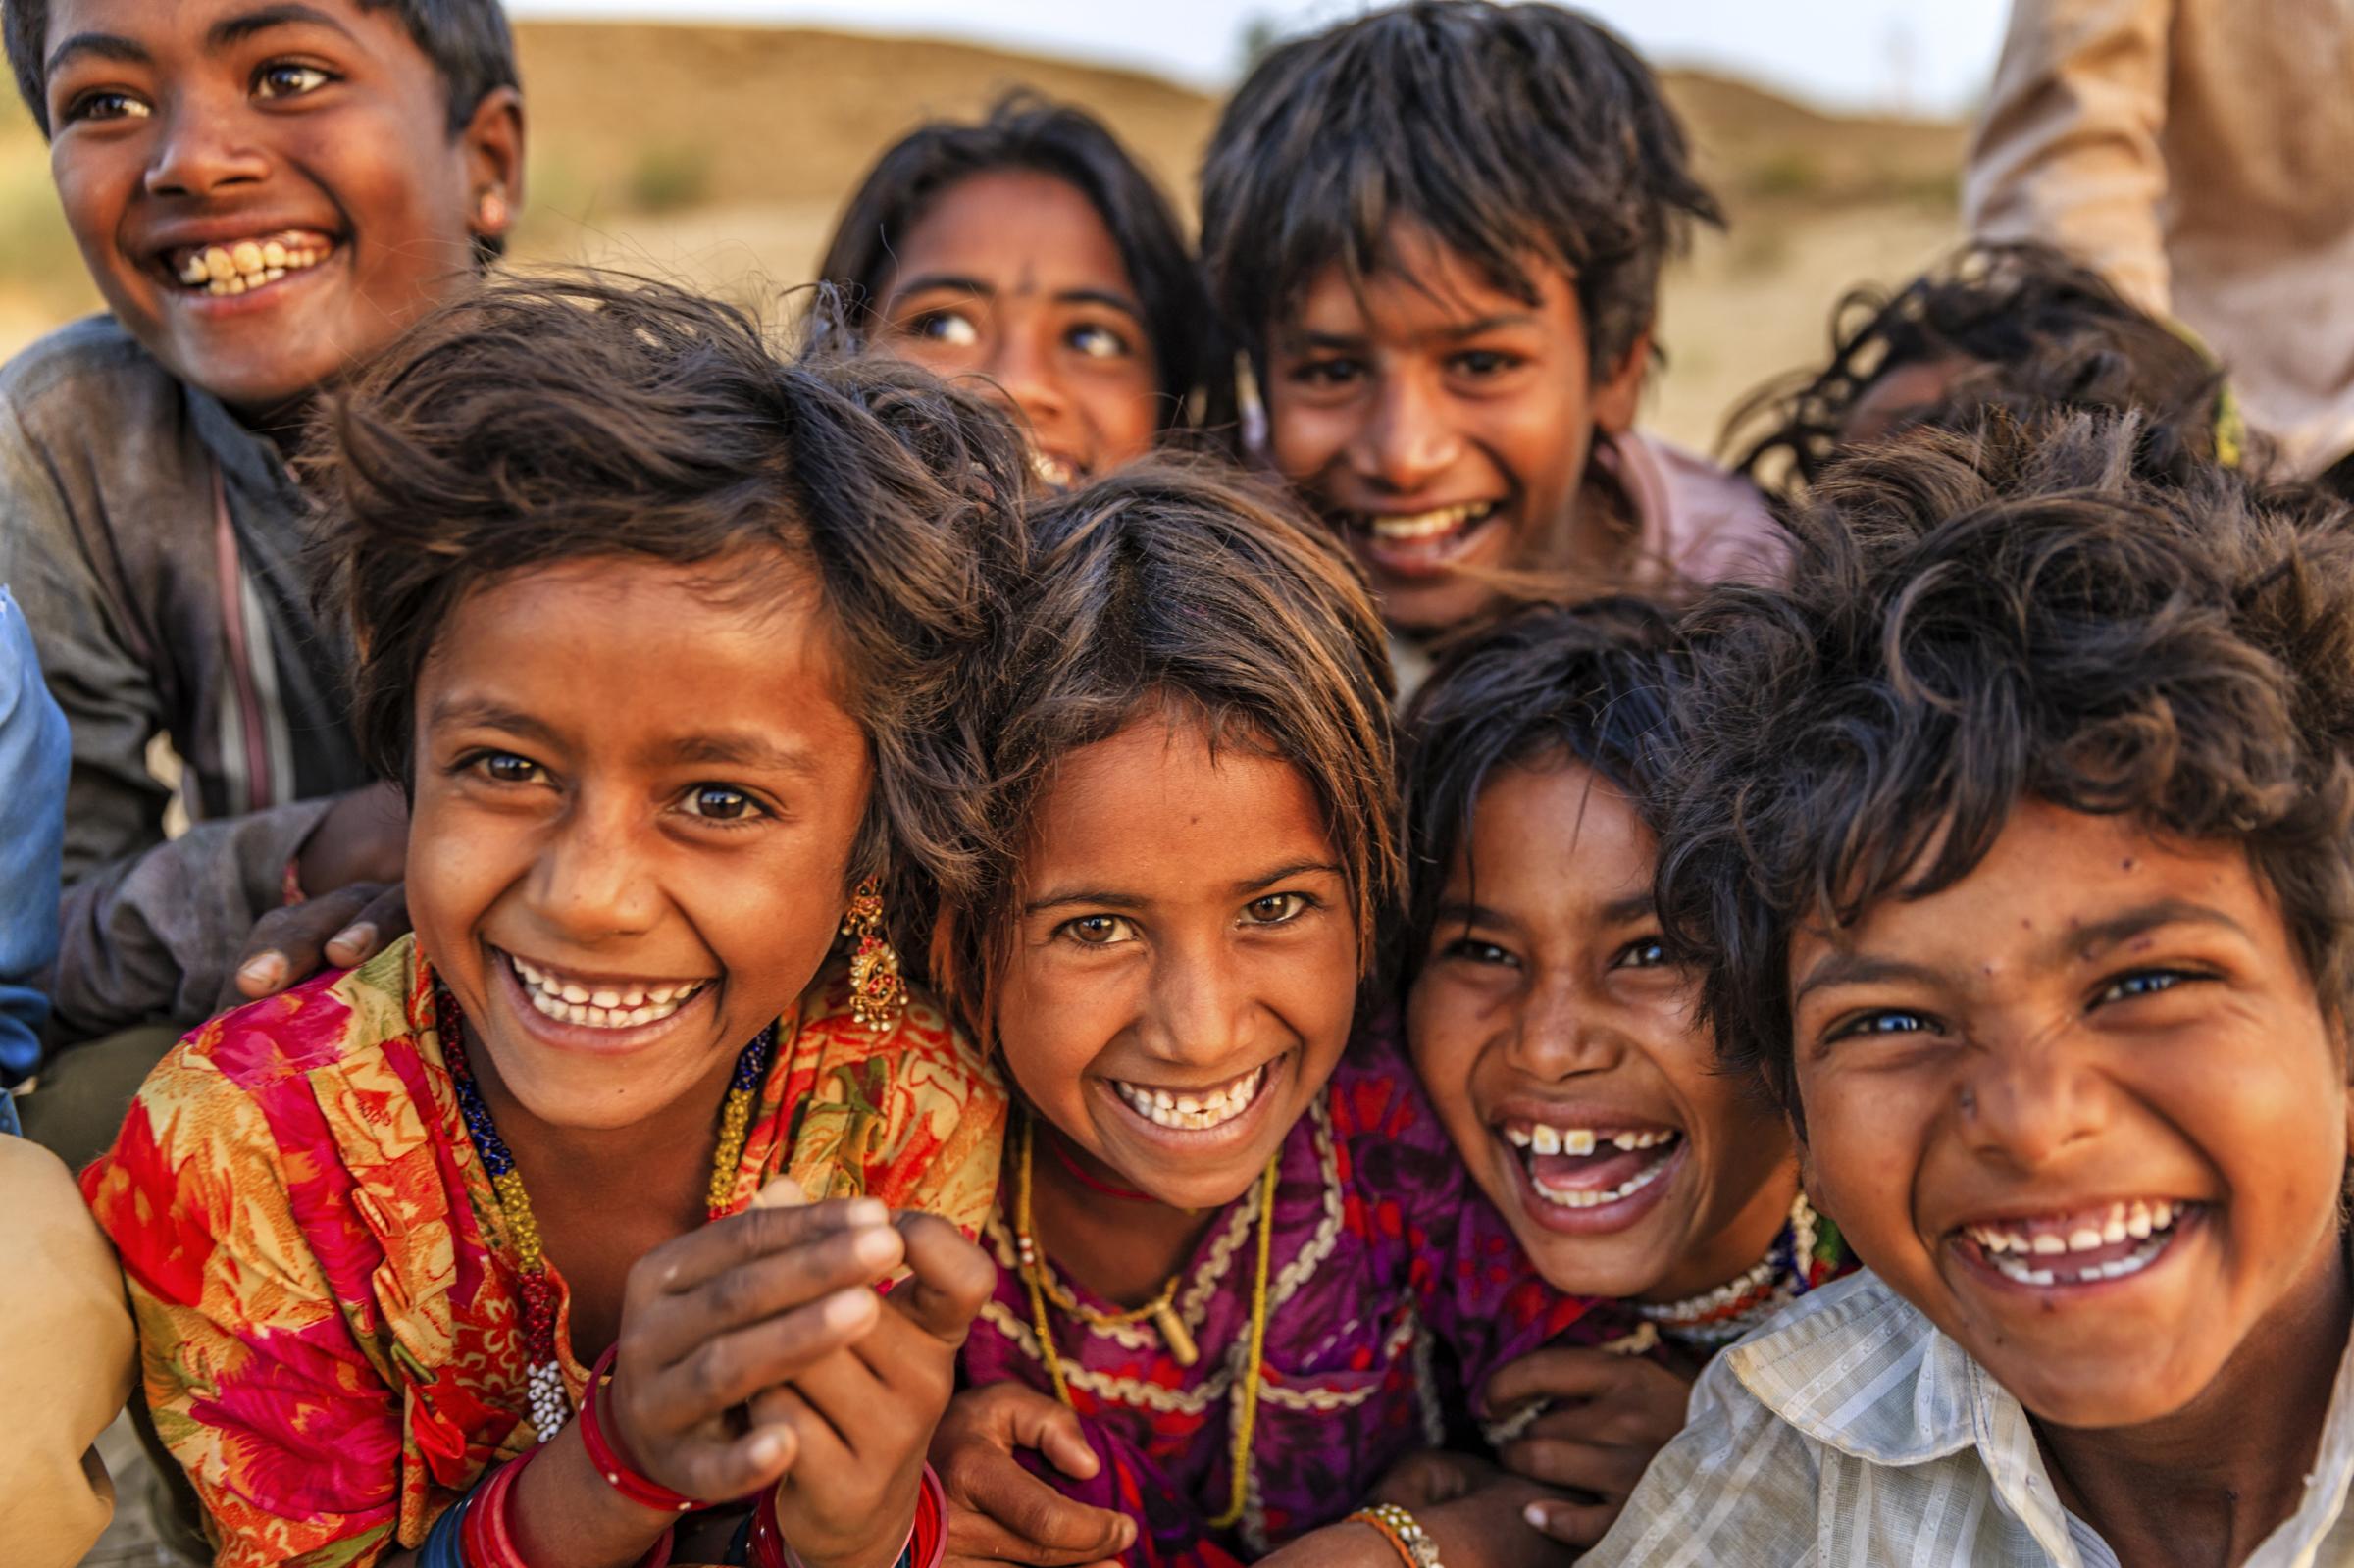 Healthy & Happy Bihar   NIOS and Bihar Health society to train rural health workers